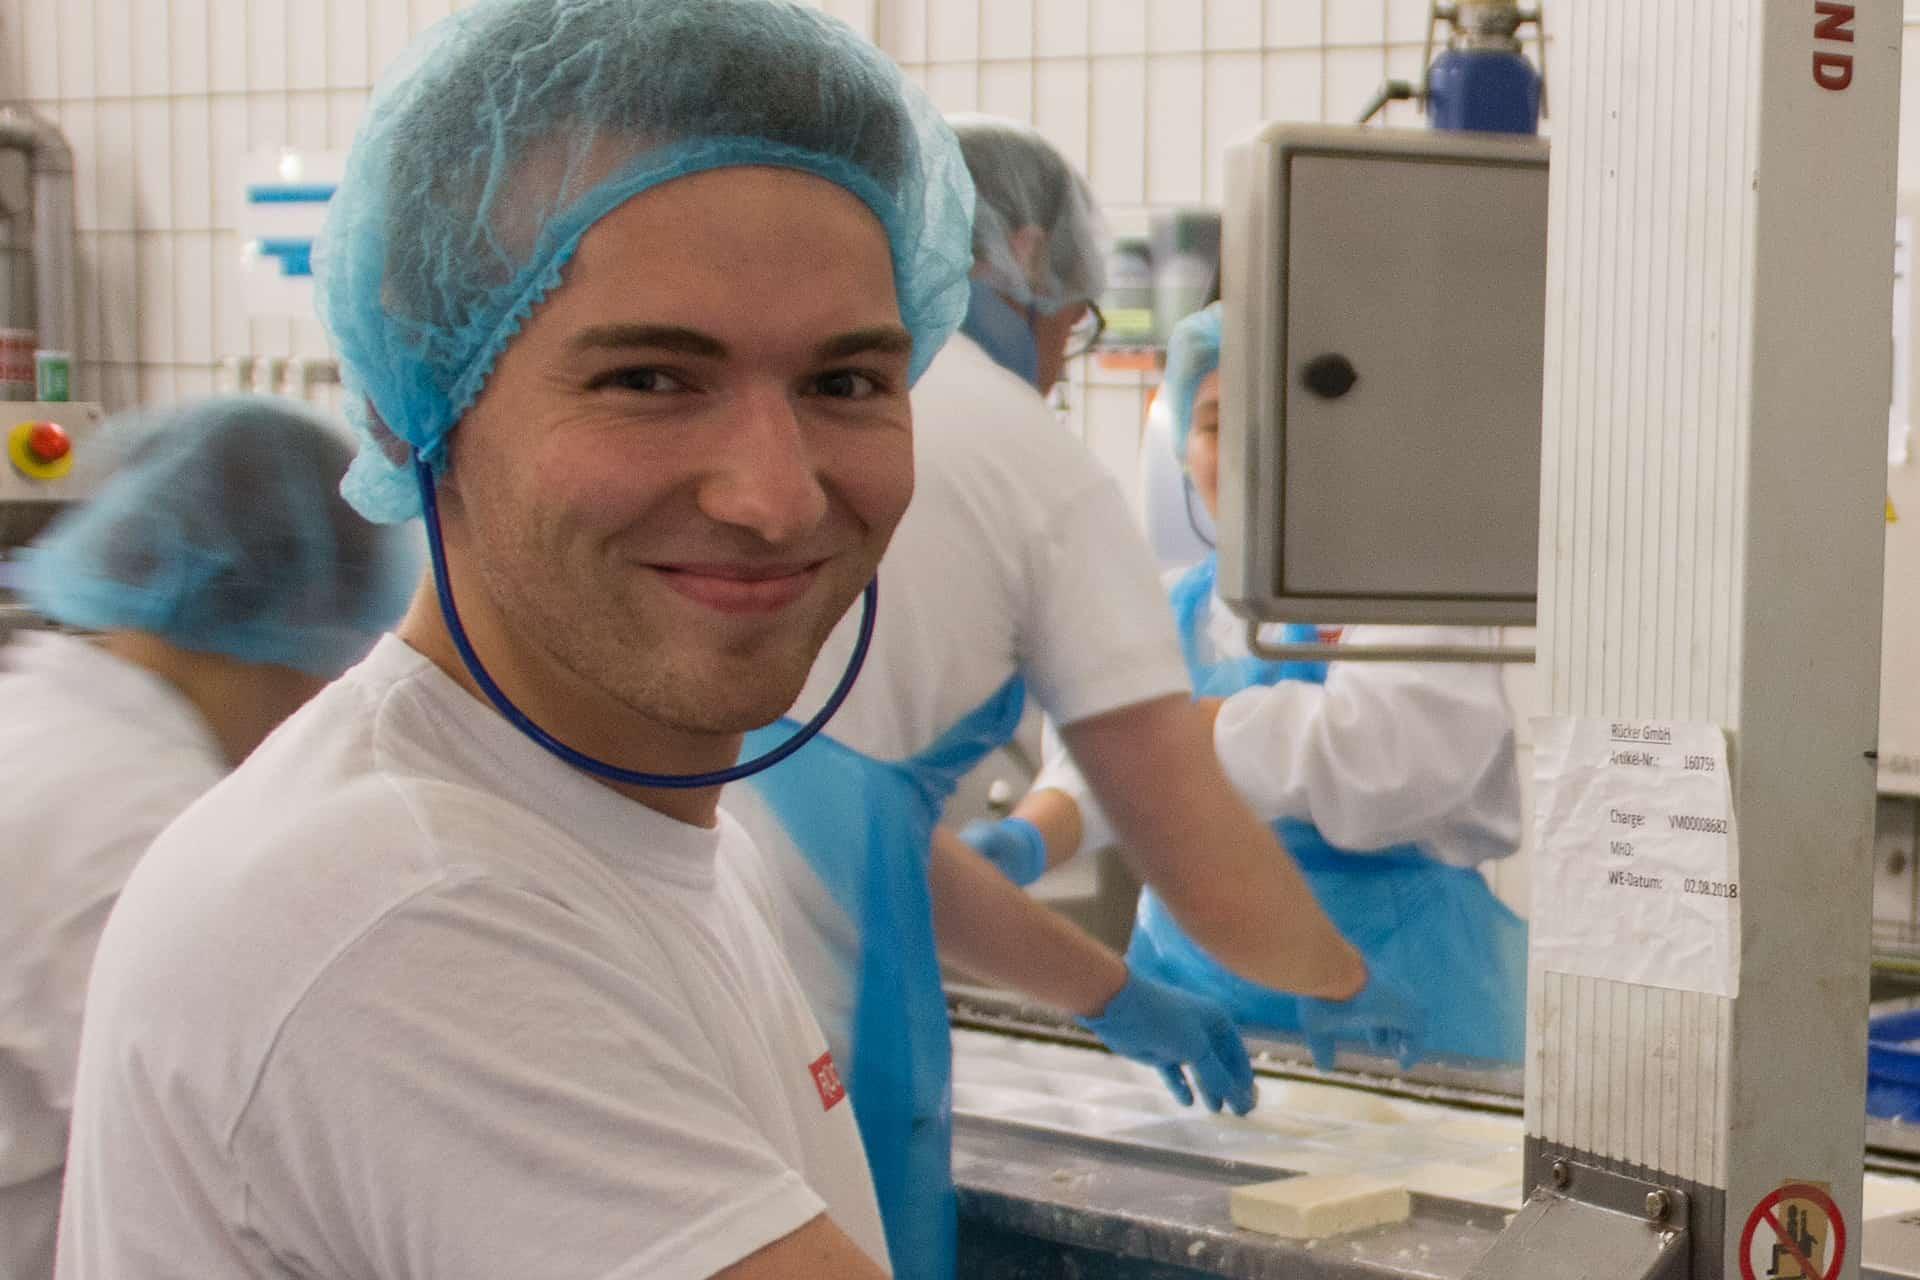 Fachkraft für Lebensmittel-Technik der Molkerei Rücker